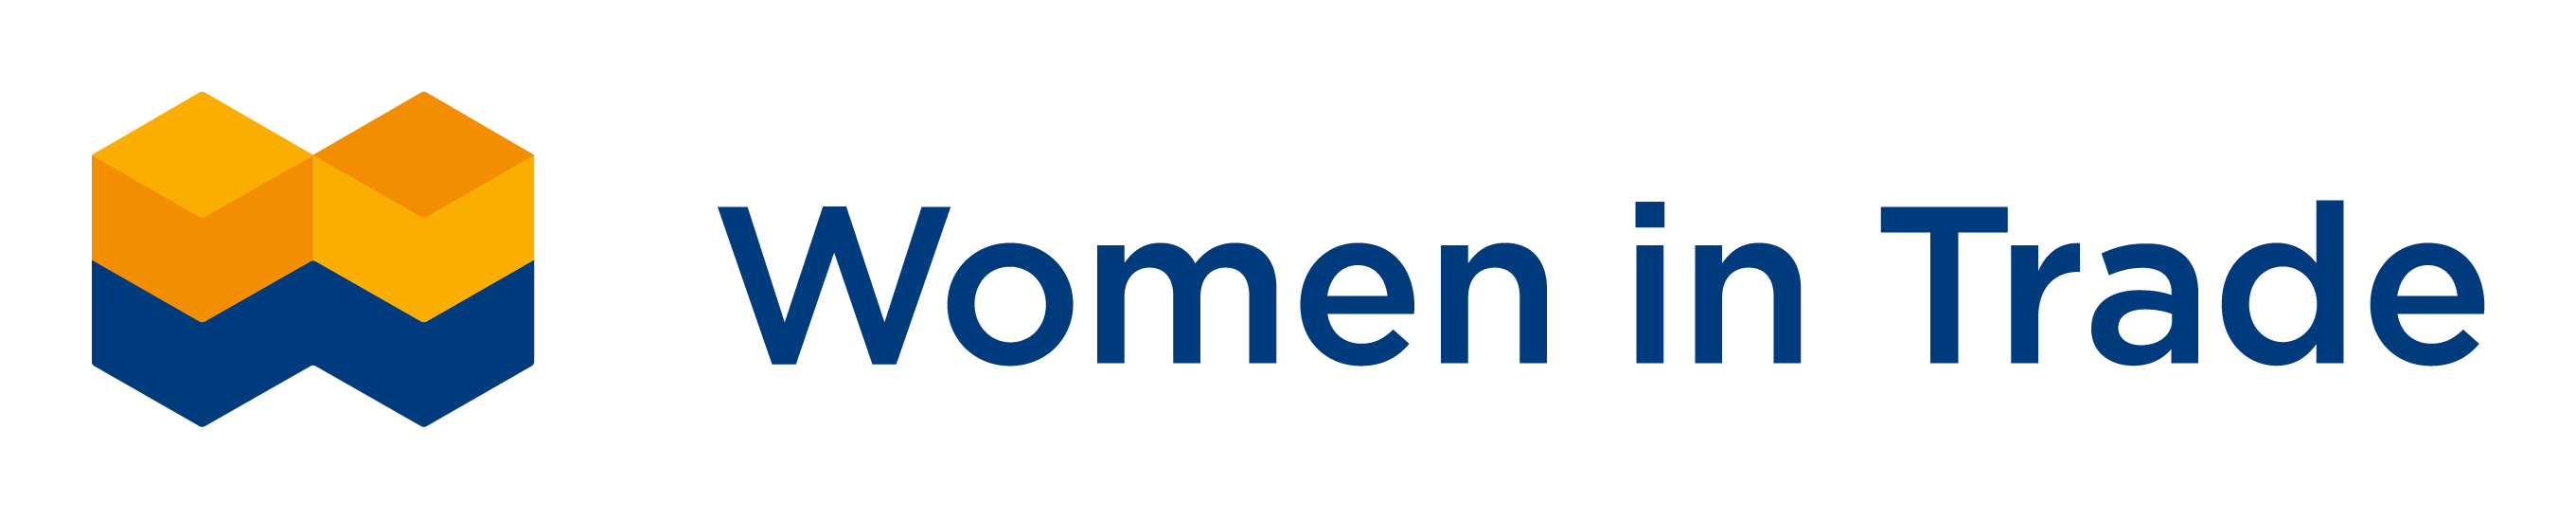 Metro-AG-Women-In-Trade FC RGB